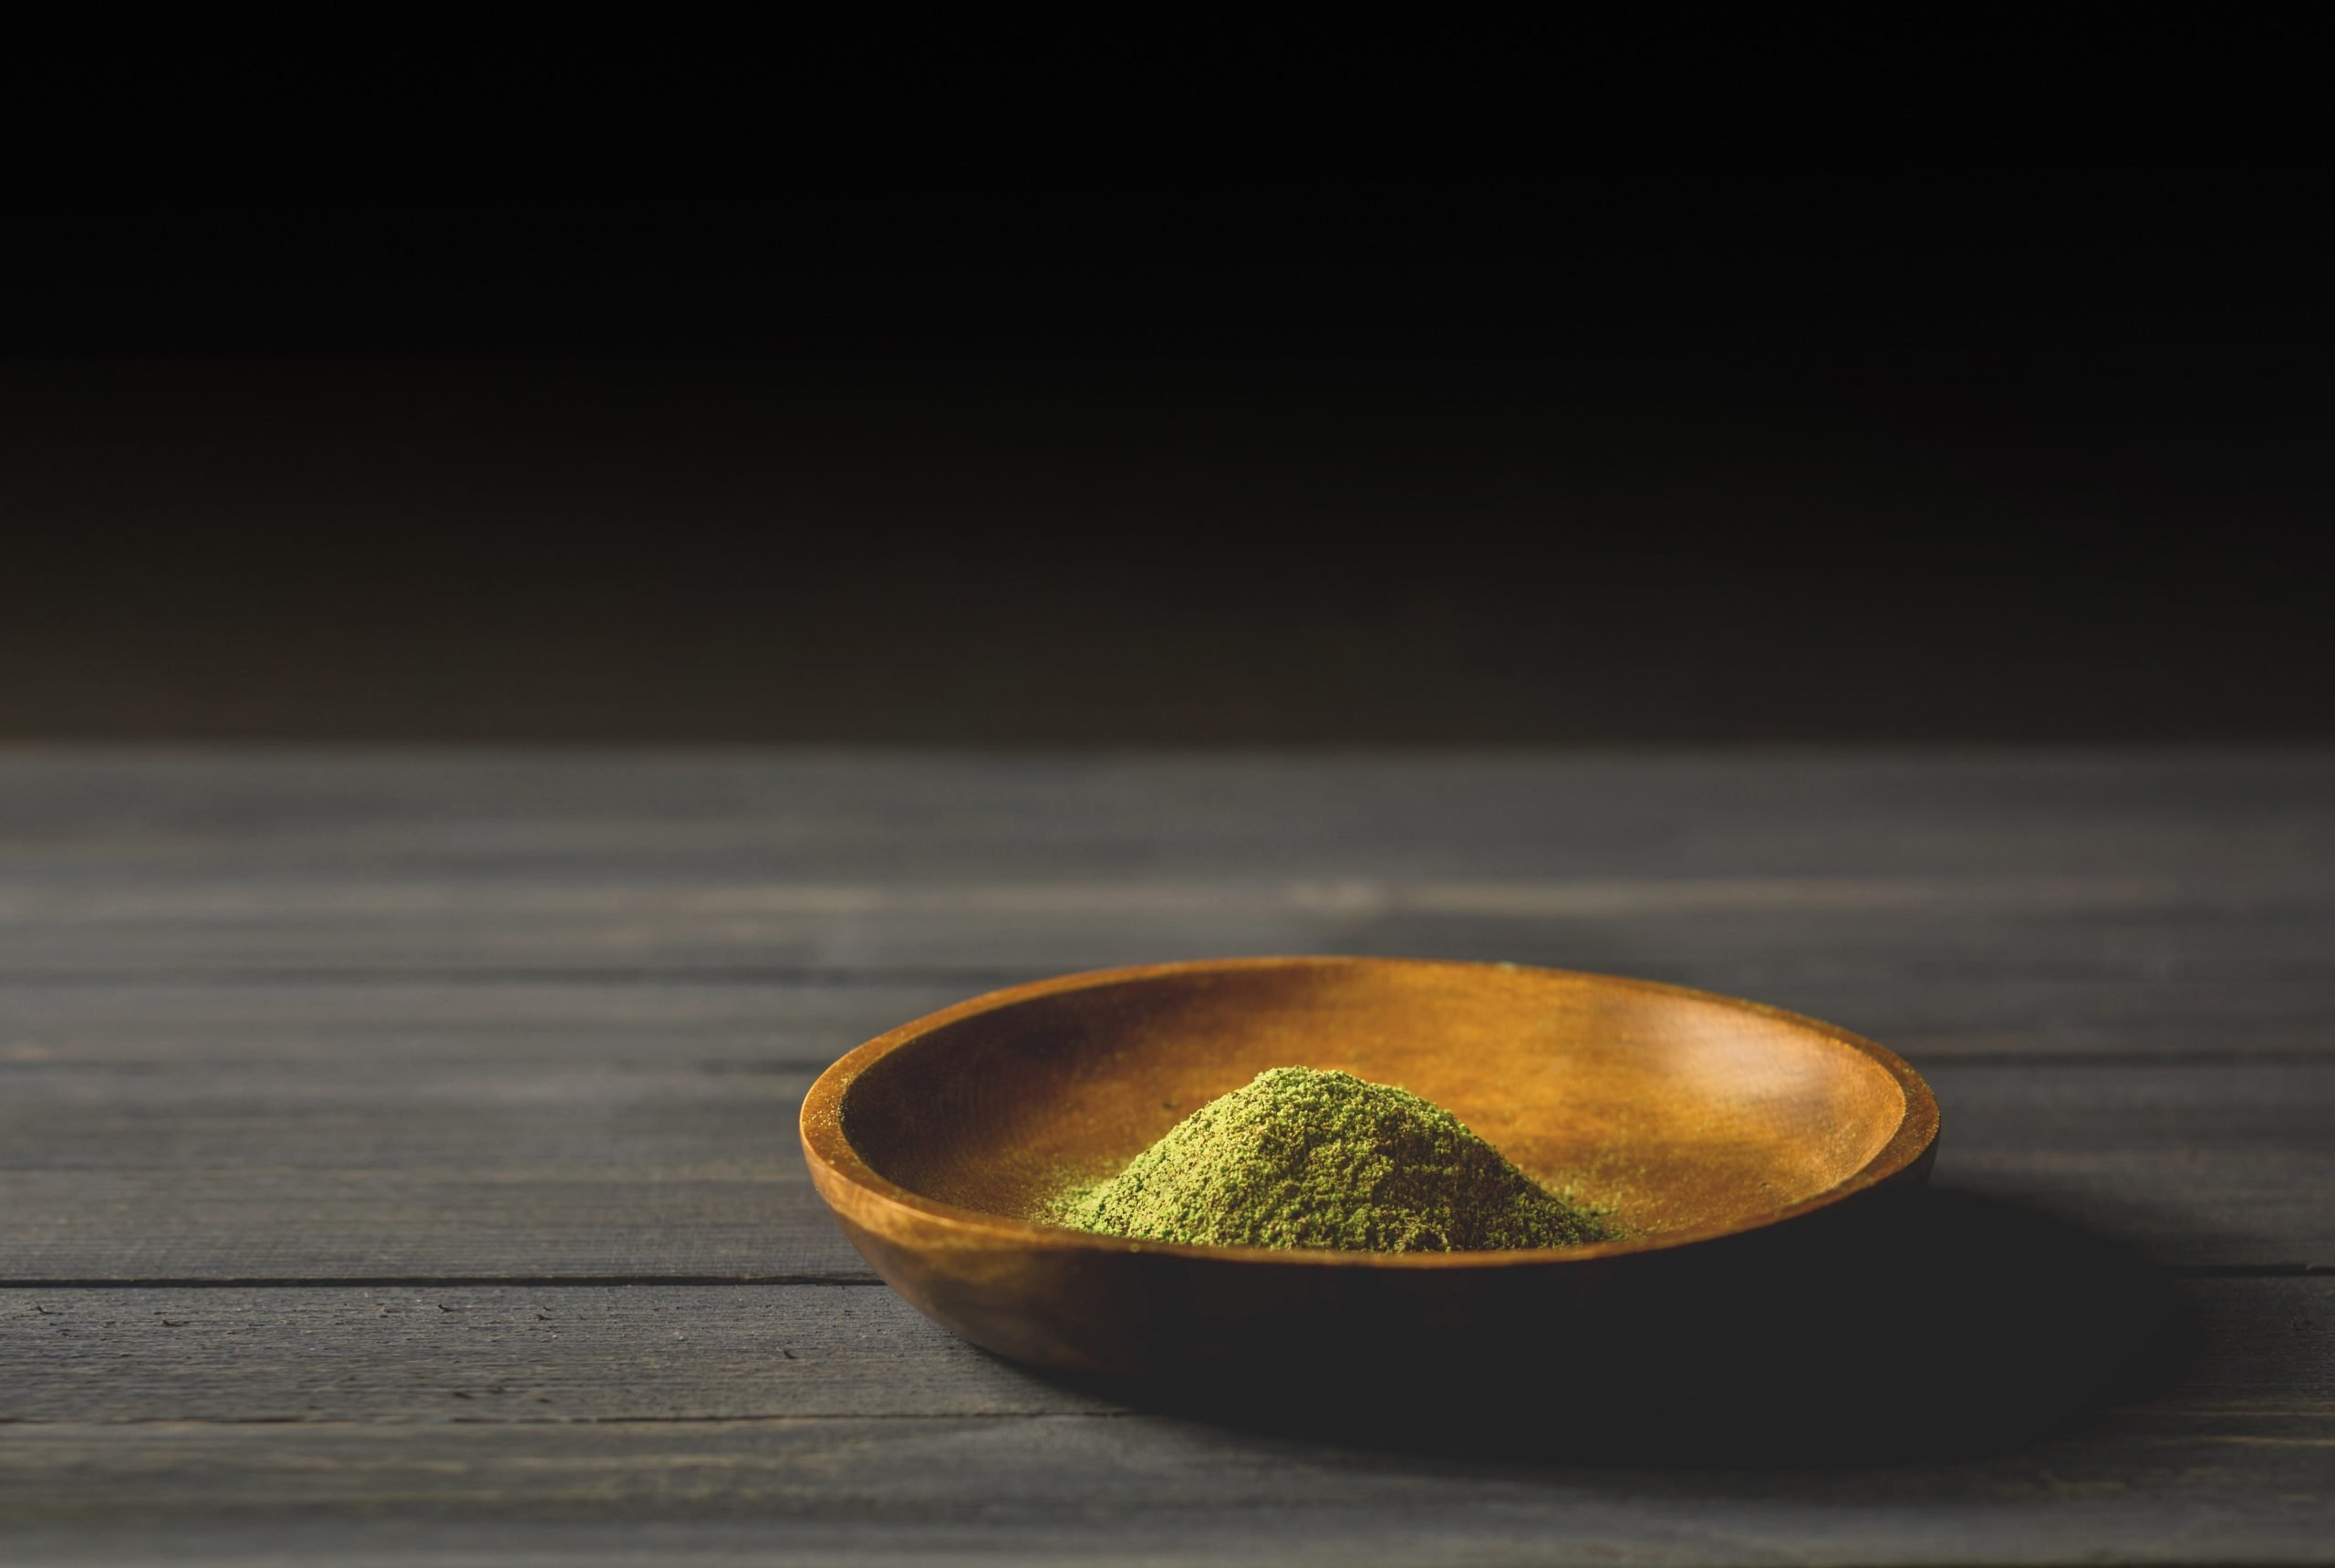 Mitragynina speciosa or Kratom powder in wooden bowl on table, chiaroscuro effect